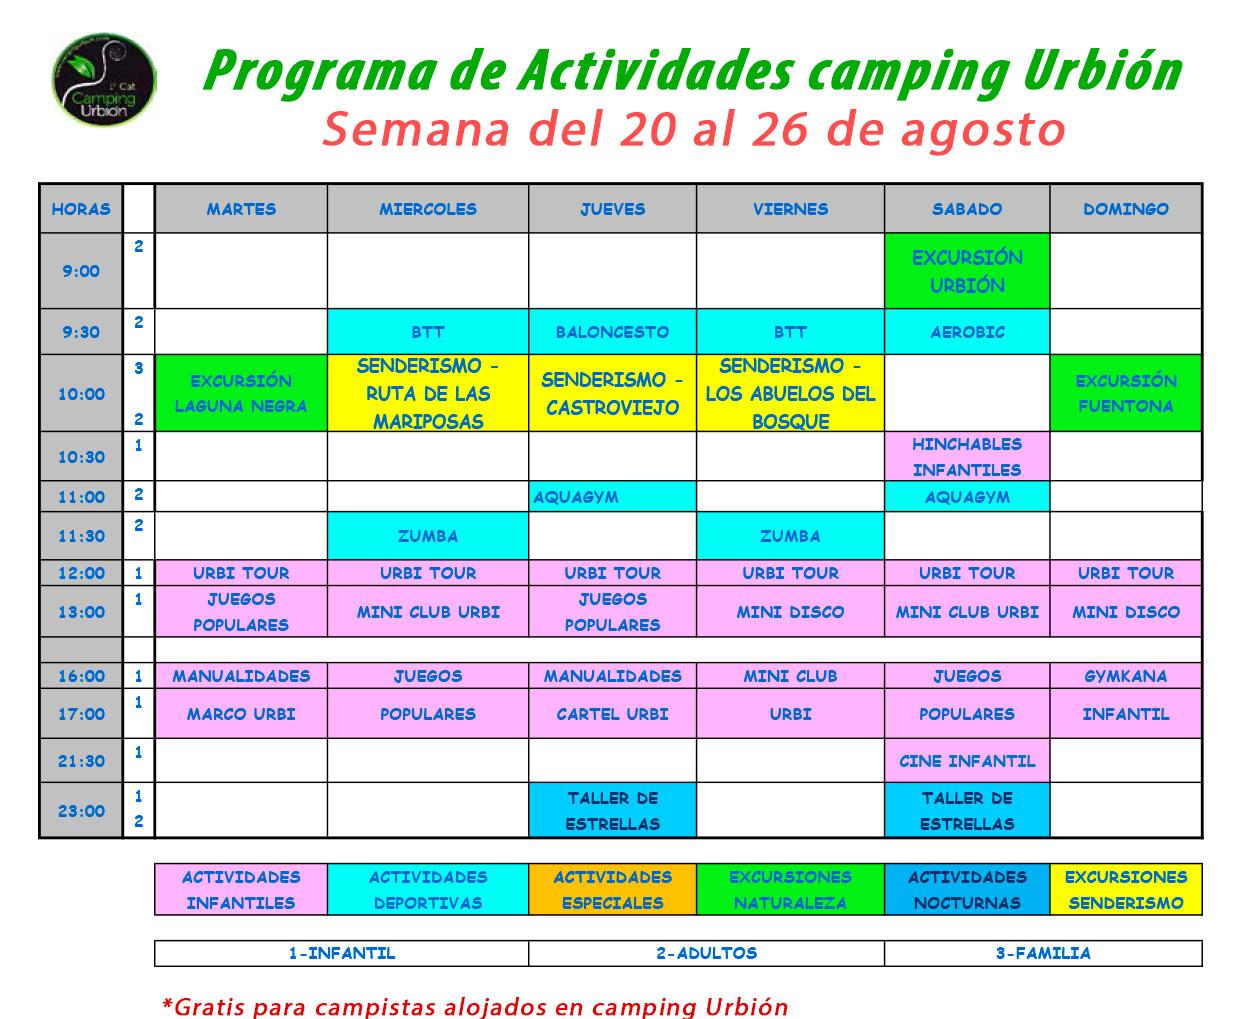 PROGRAMA-ACTIVIDADES-SEMANA-26-AGOSTO-CAMPING-URBION (1)